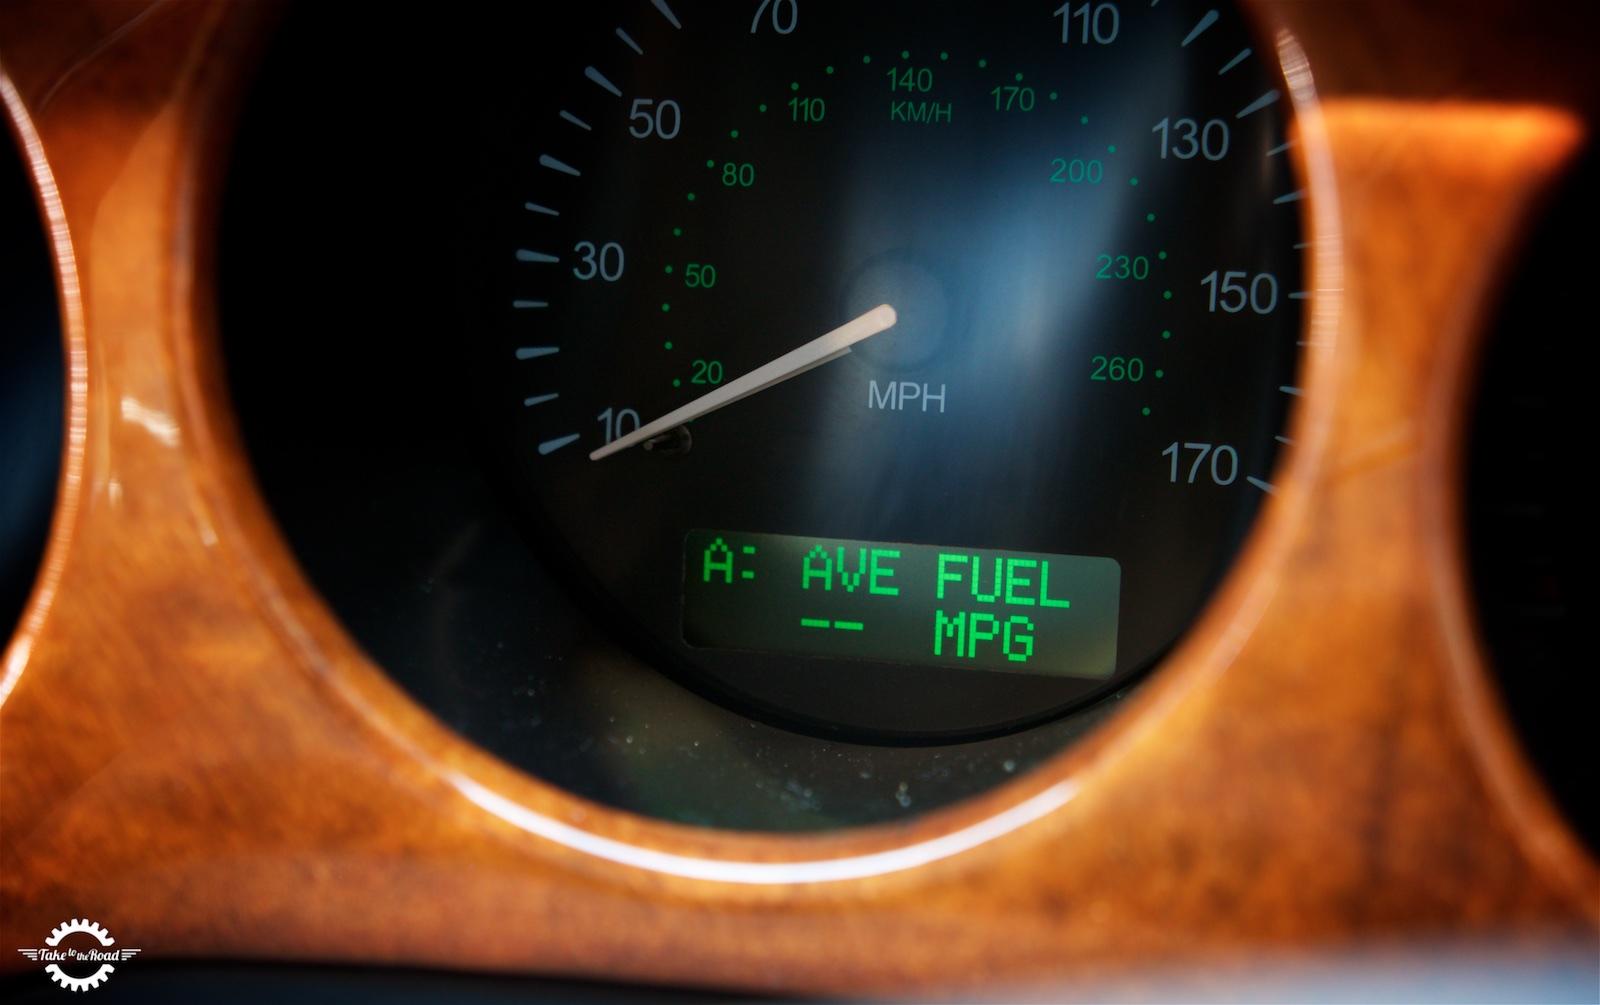 Take to the Road Jaguar XJ8 Redex Trial Part 3